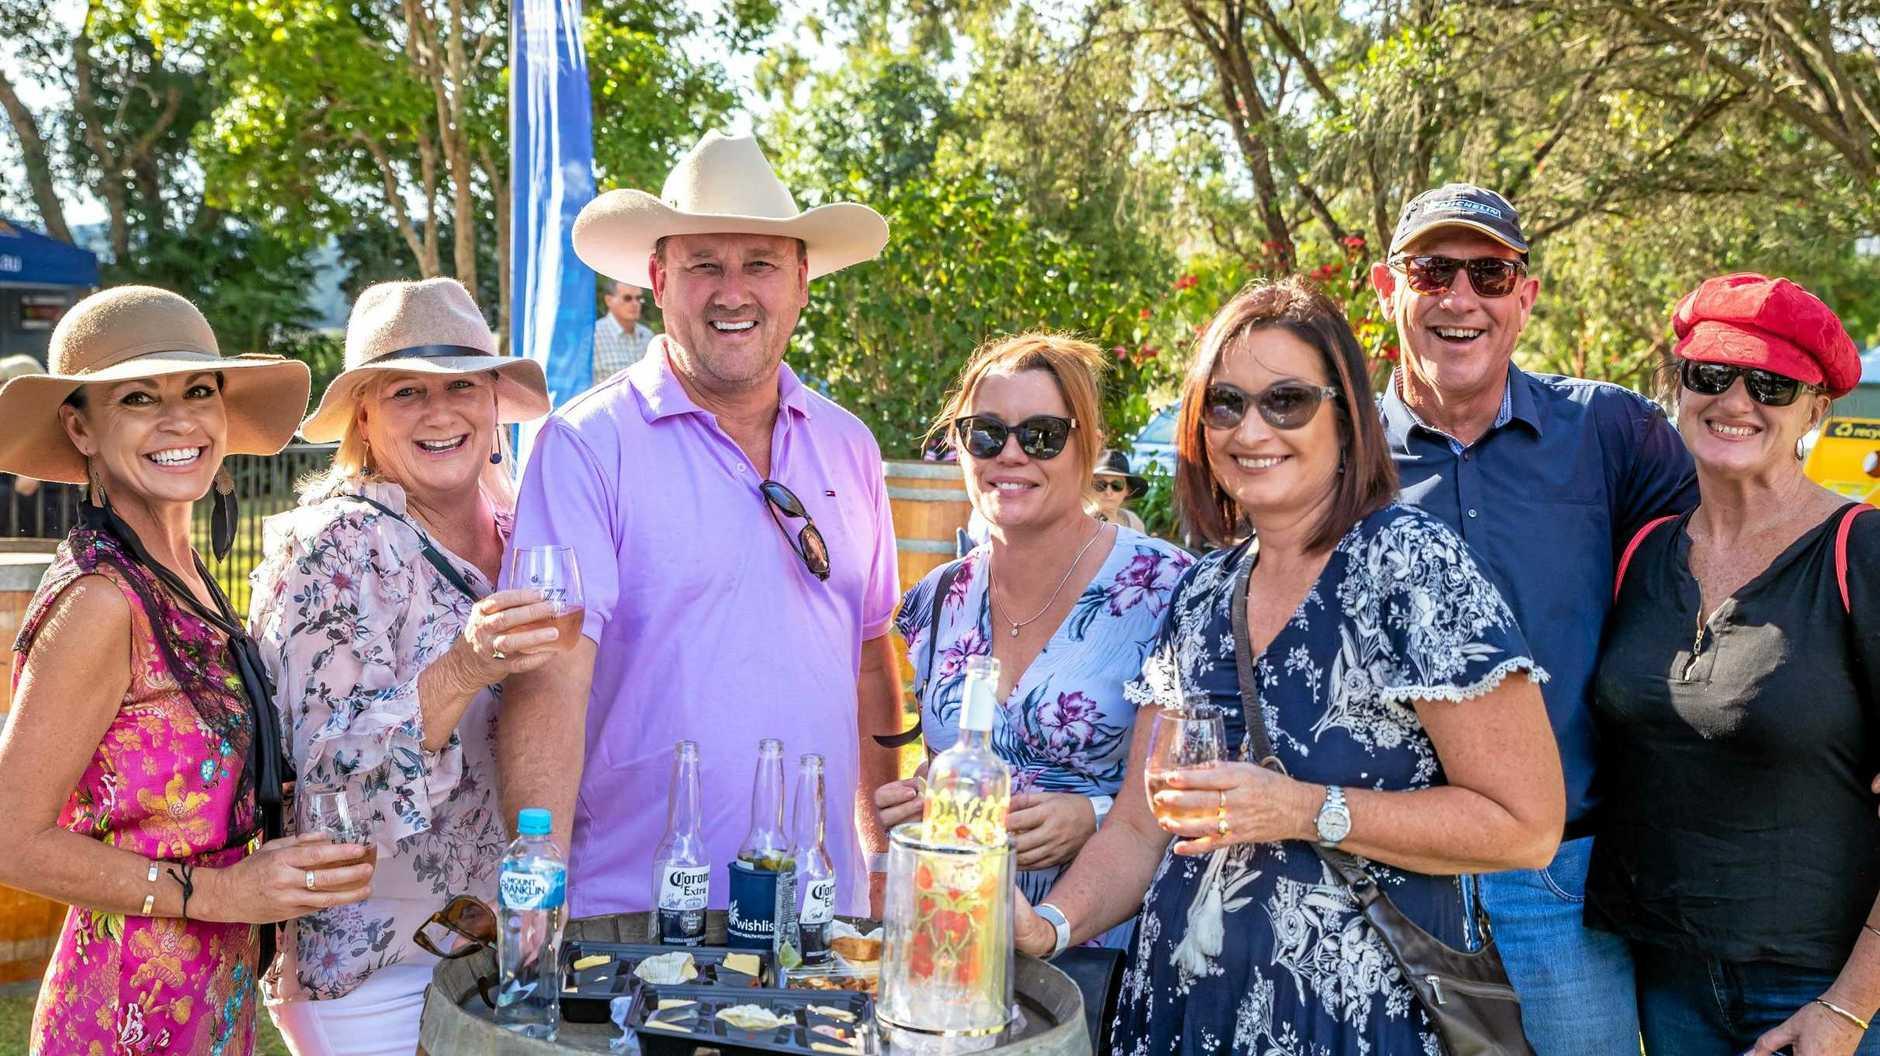 2018 Wishlist Jazz and Wine Festival - Mareen Walters, Theresa Field, Glenn Field, Nicole Atkinson, Kerry Zaninetti, Barry Webb, Alison Stockel.